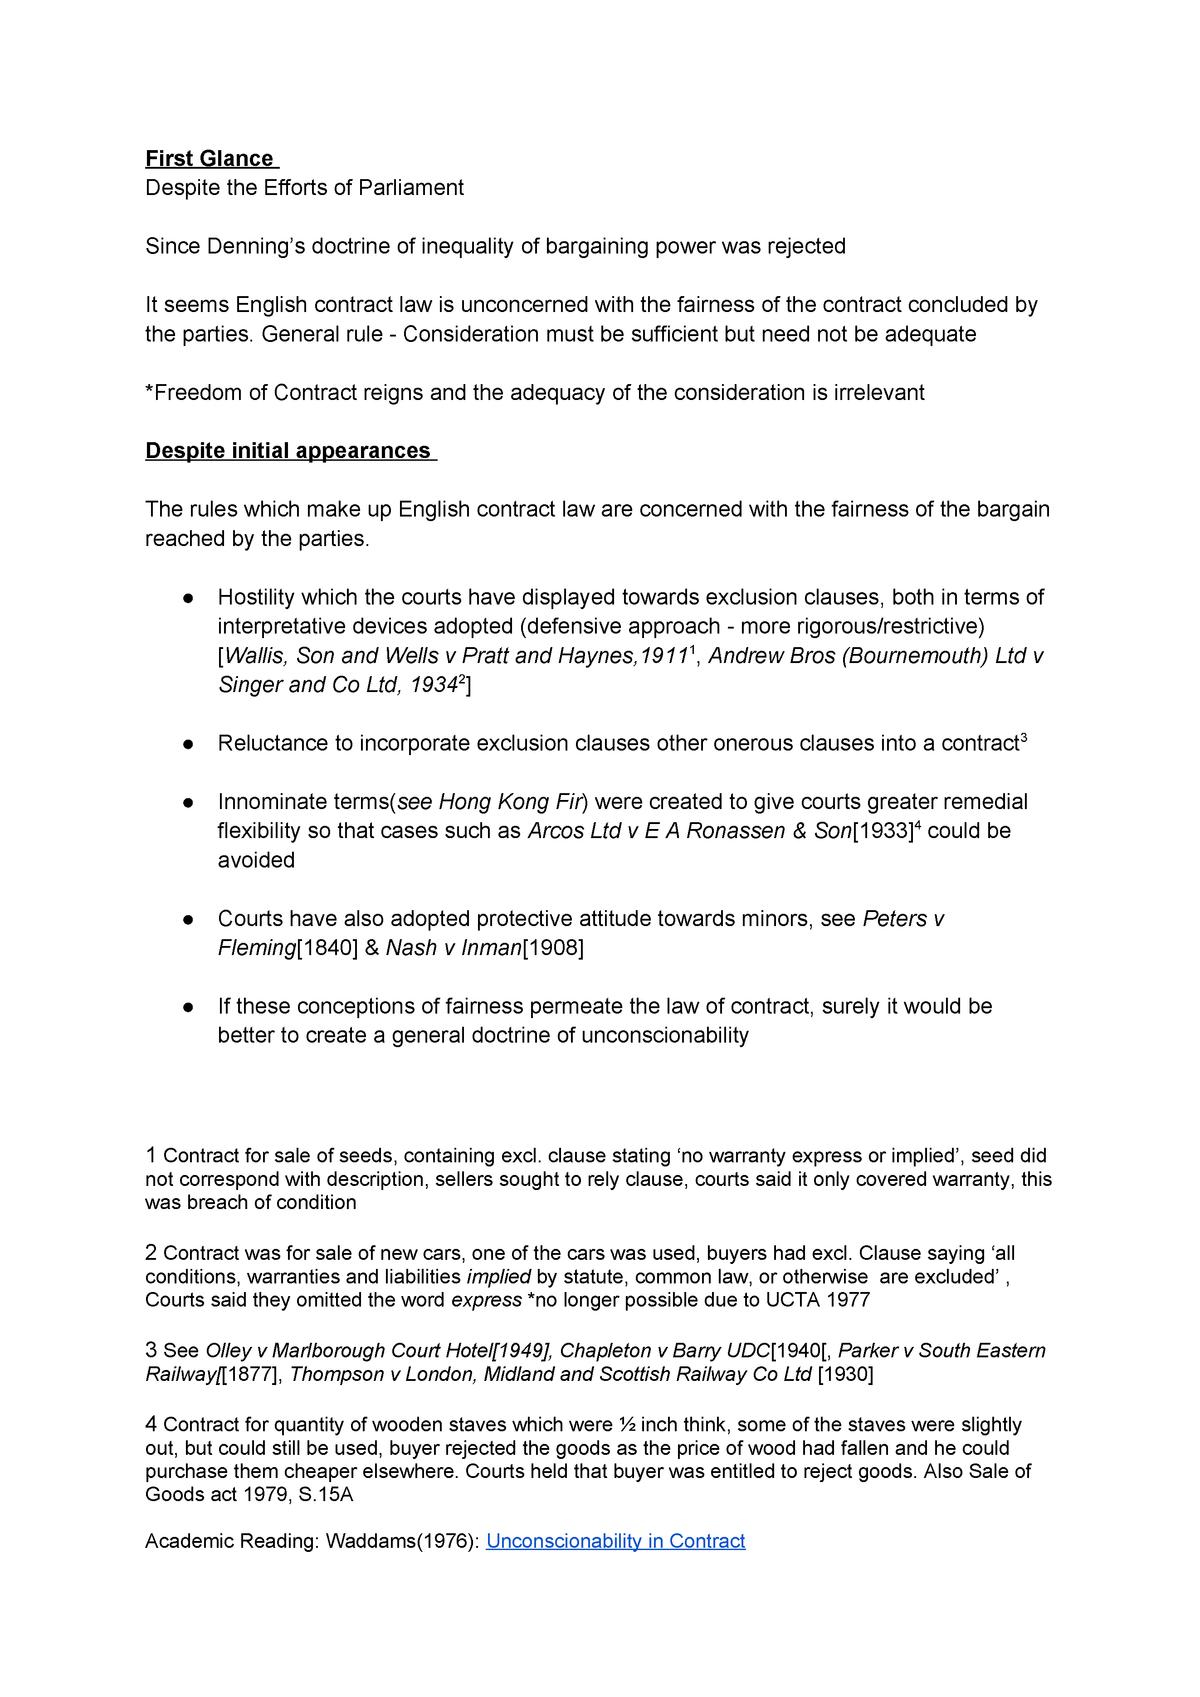 Summary Contract Law 09 May 2019 - StuDocu